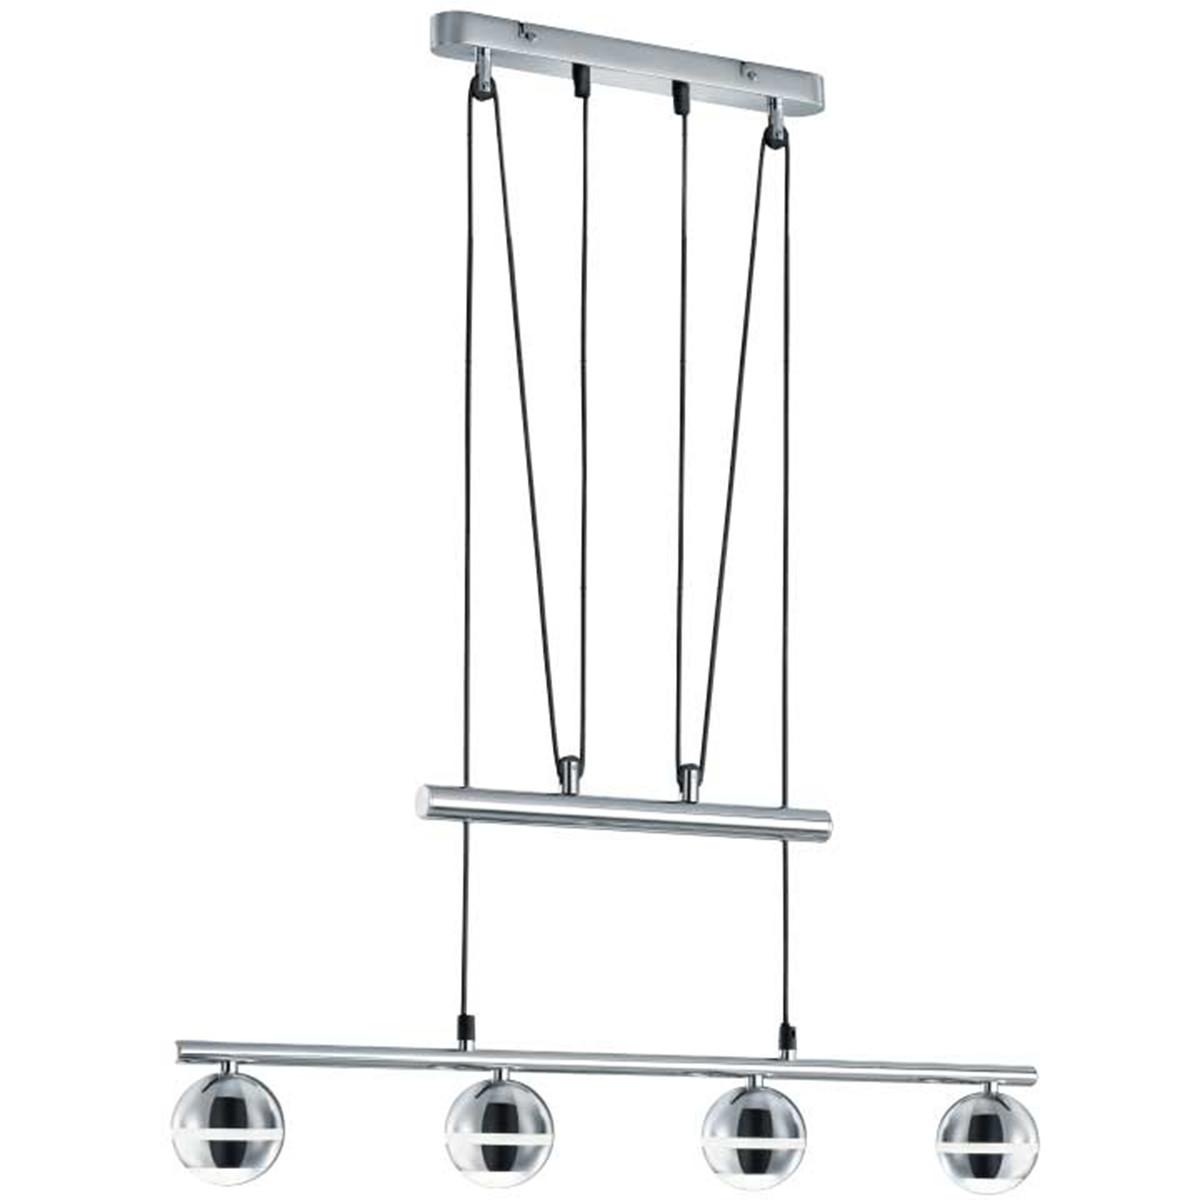 LED Hanglamp - Trion Bonaret - 12W - Warm Wit 3100K - 4-lichts - Rechthoek - Glans Chroom - Aluminiu